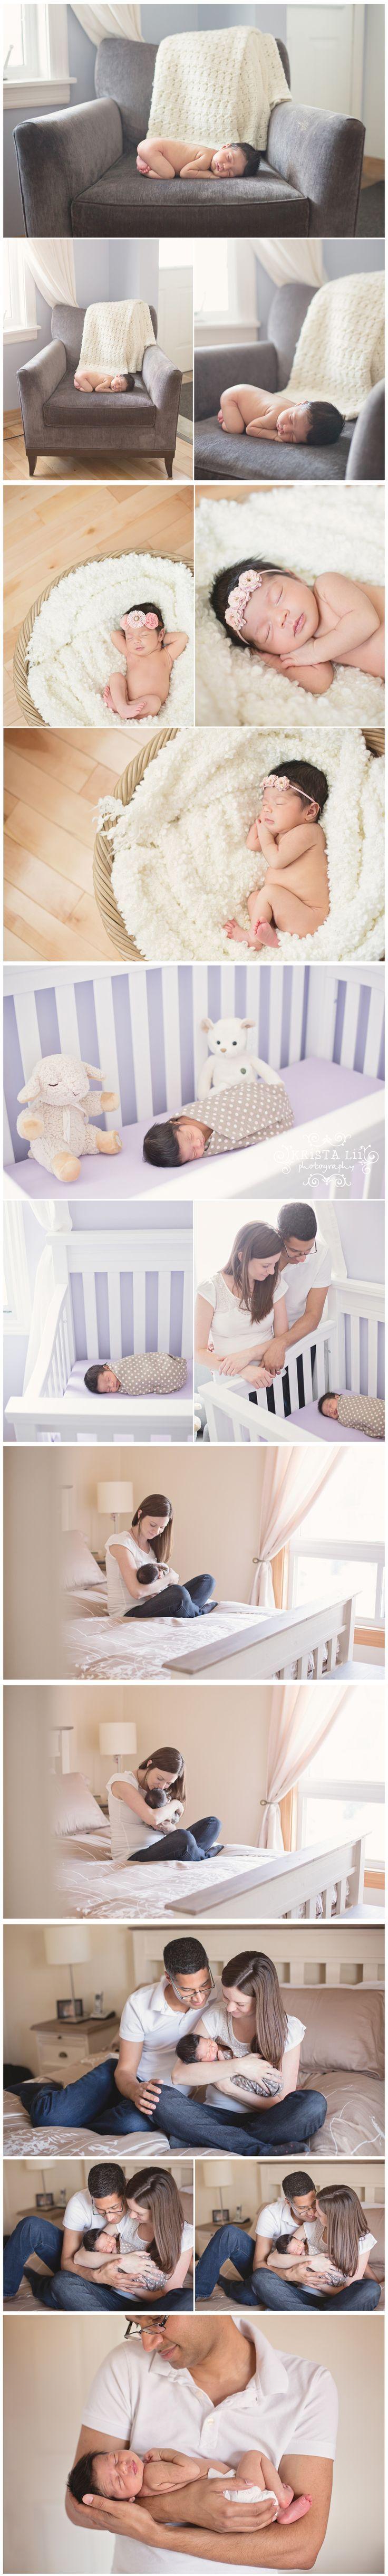 nice Lifestyle Newborn Photography by Krista Lii | Toronto Newborn Photographer Jason...